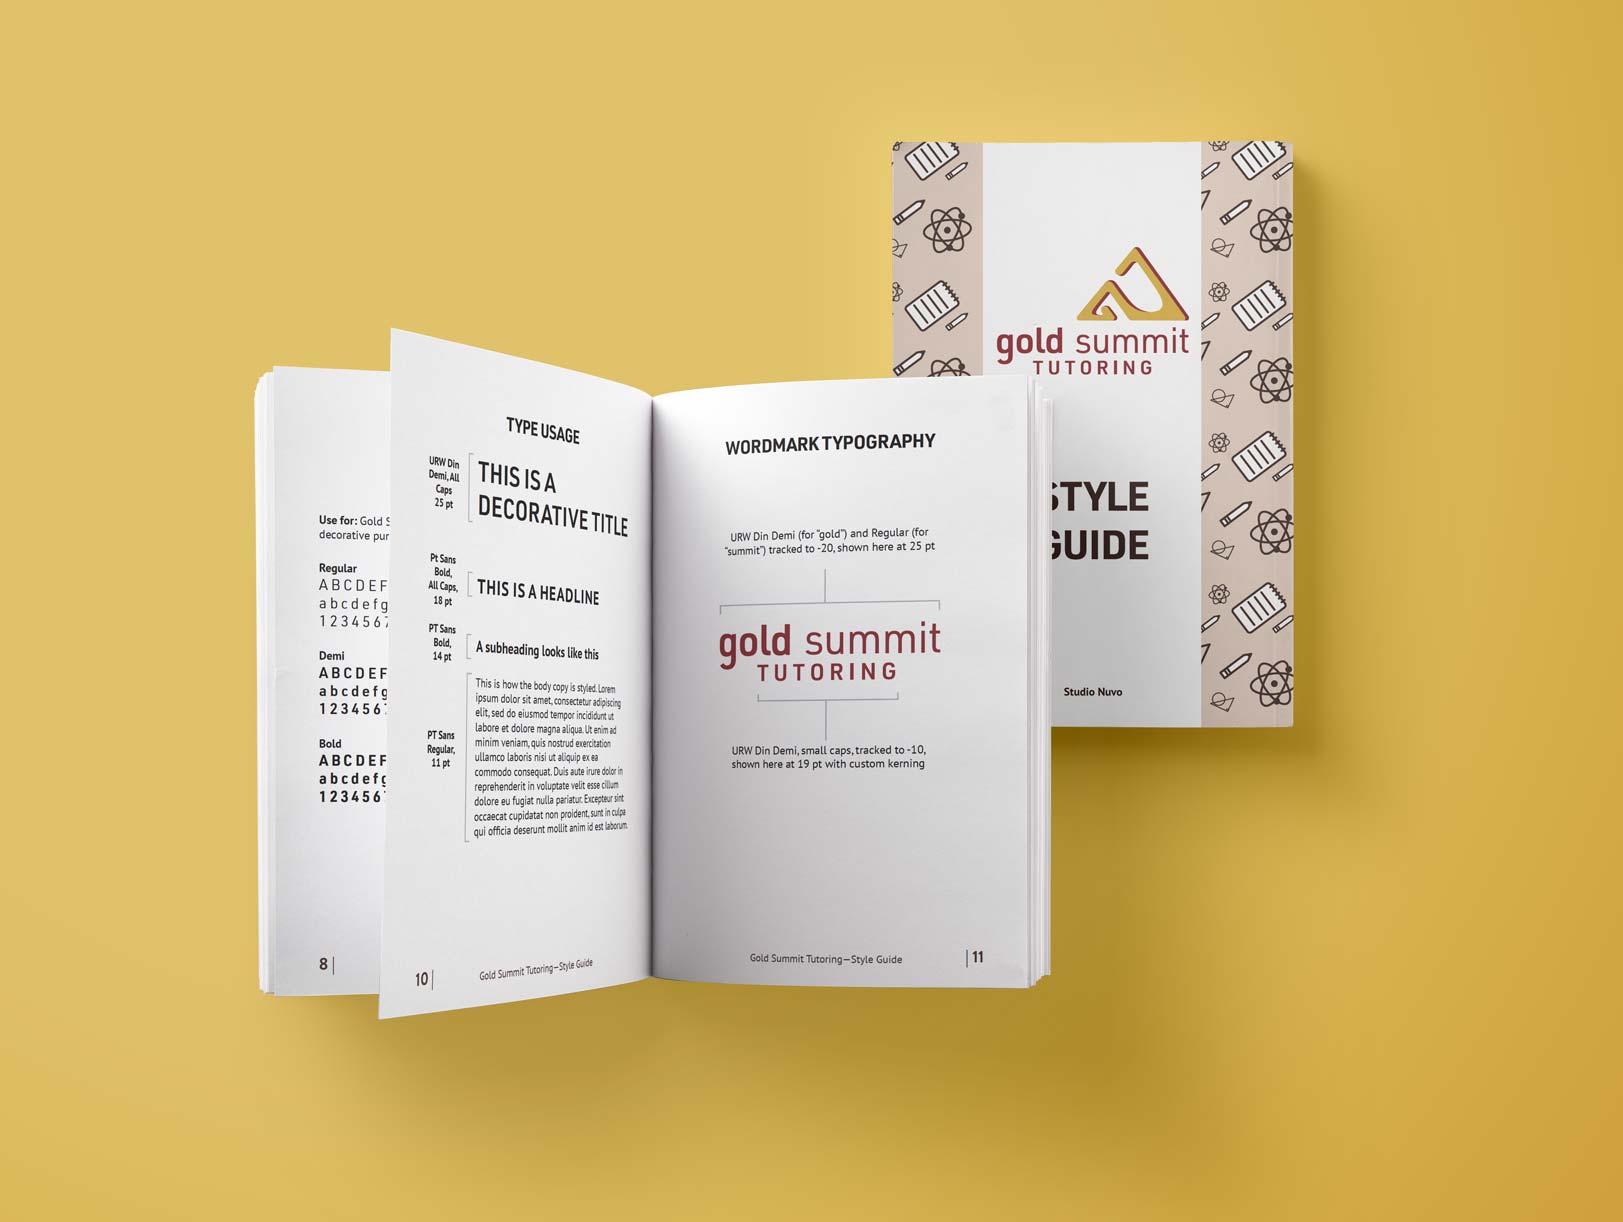 Style guide Gold Summit Tutoring by Alina Demidova